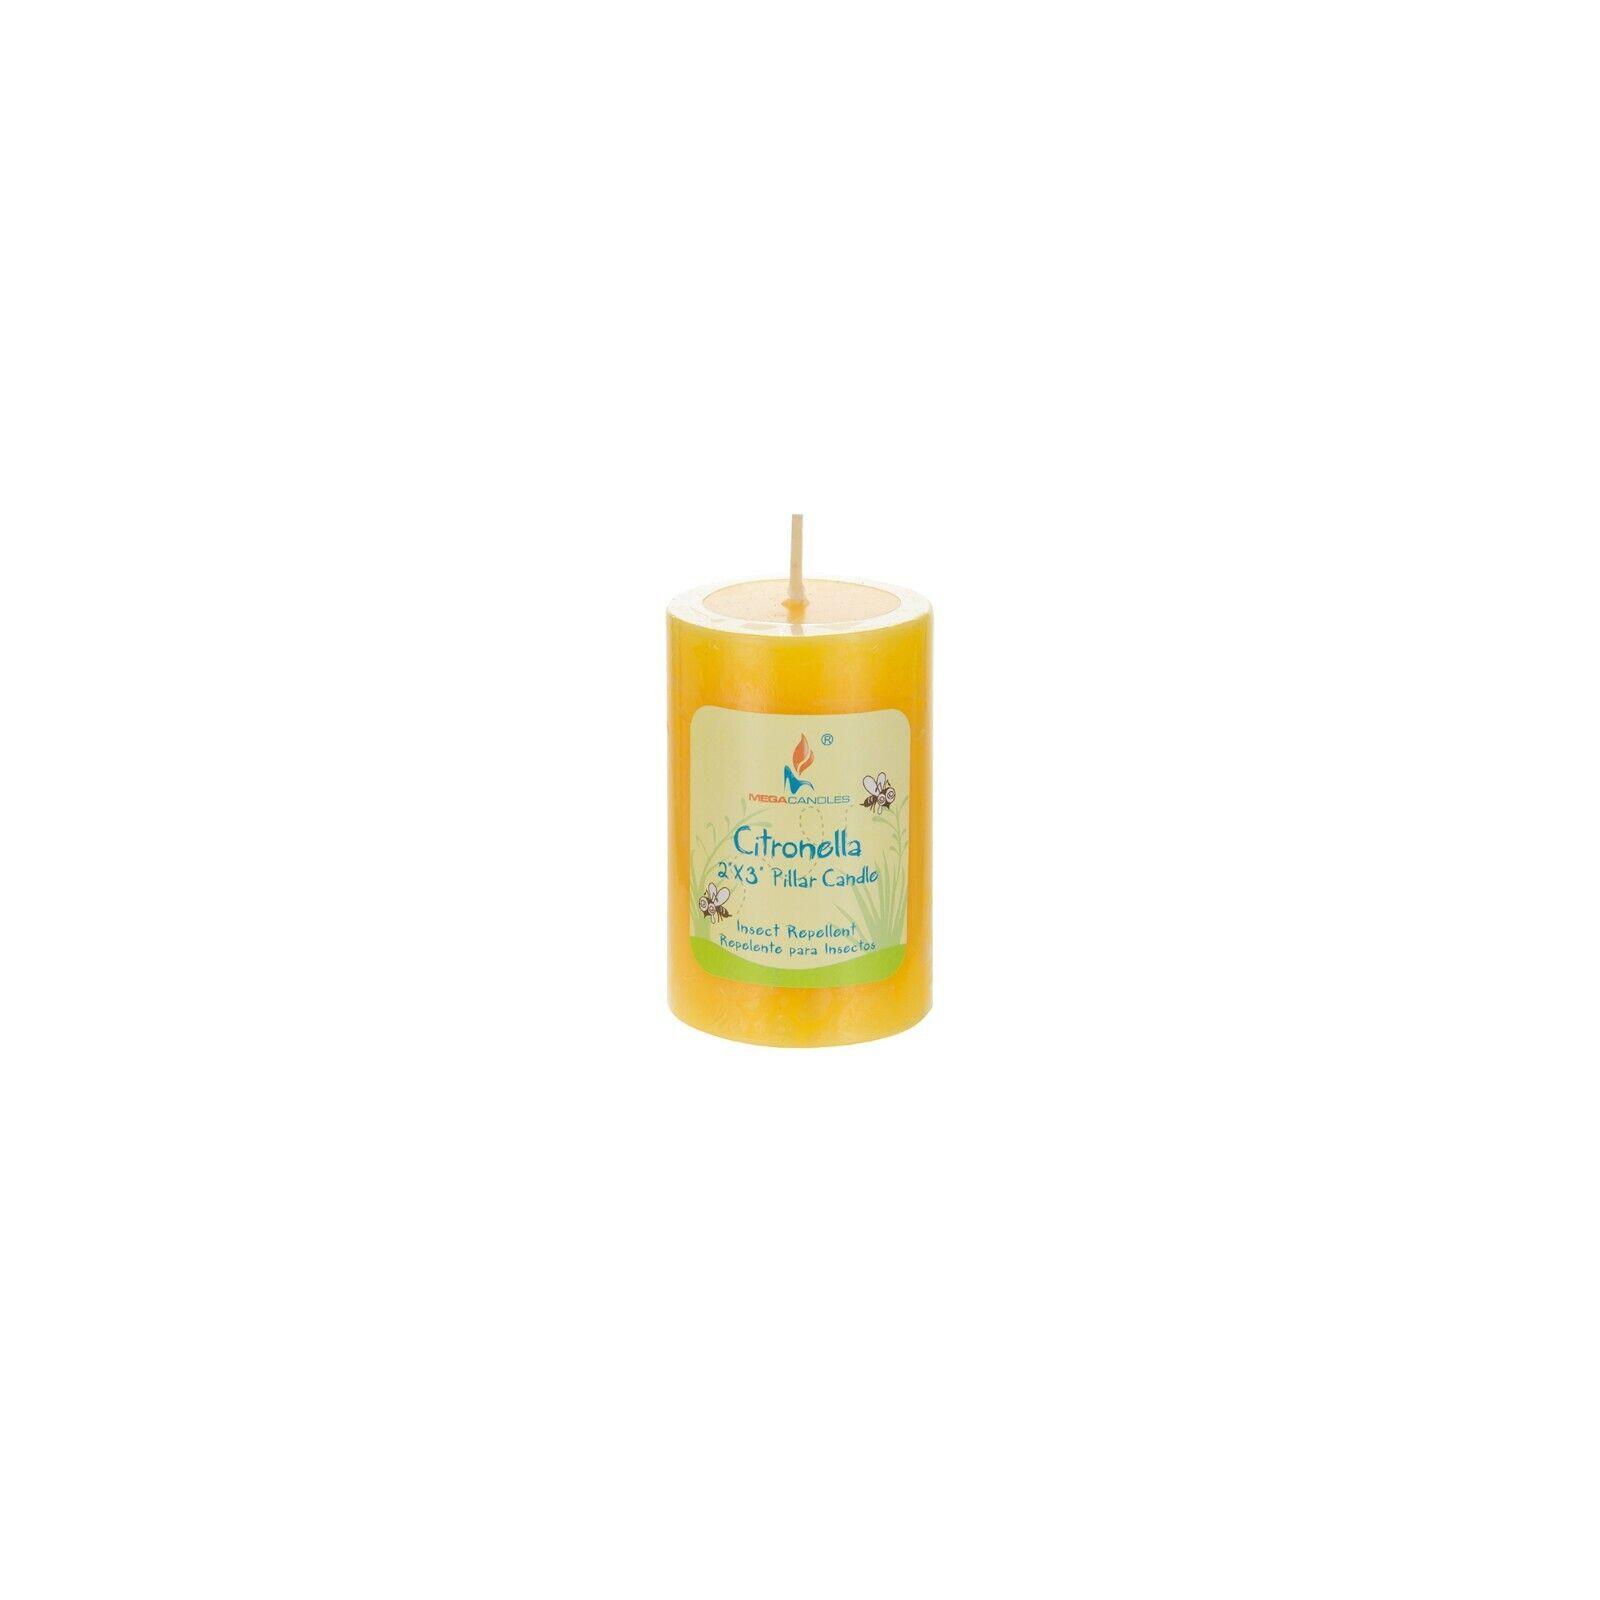 Mega Candles 1 pcs Citronella Round Pillar Candle | Hand Pou